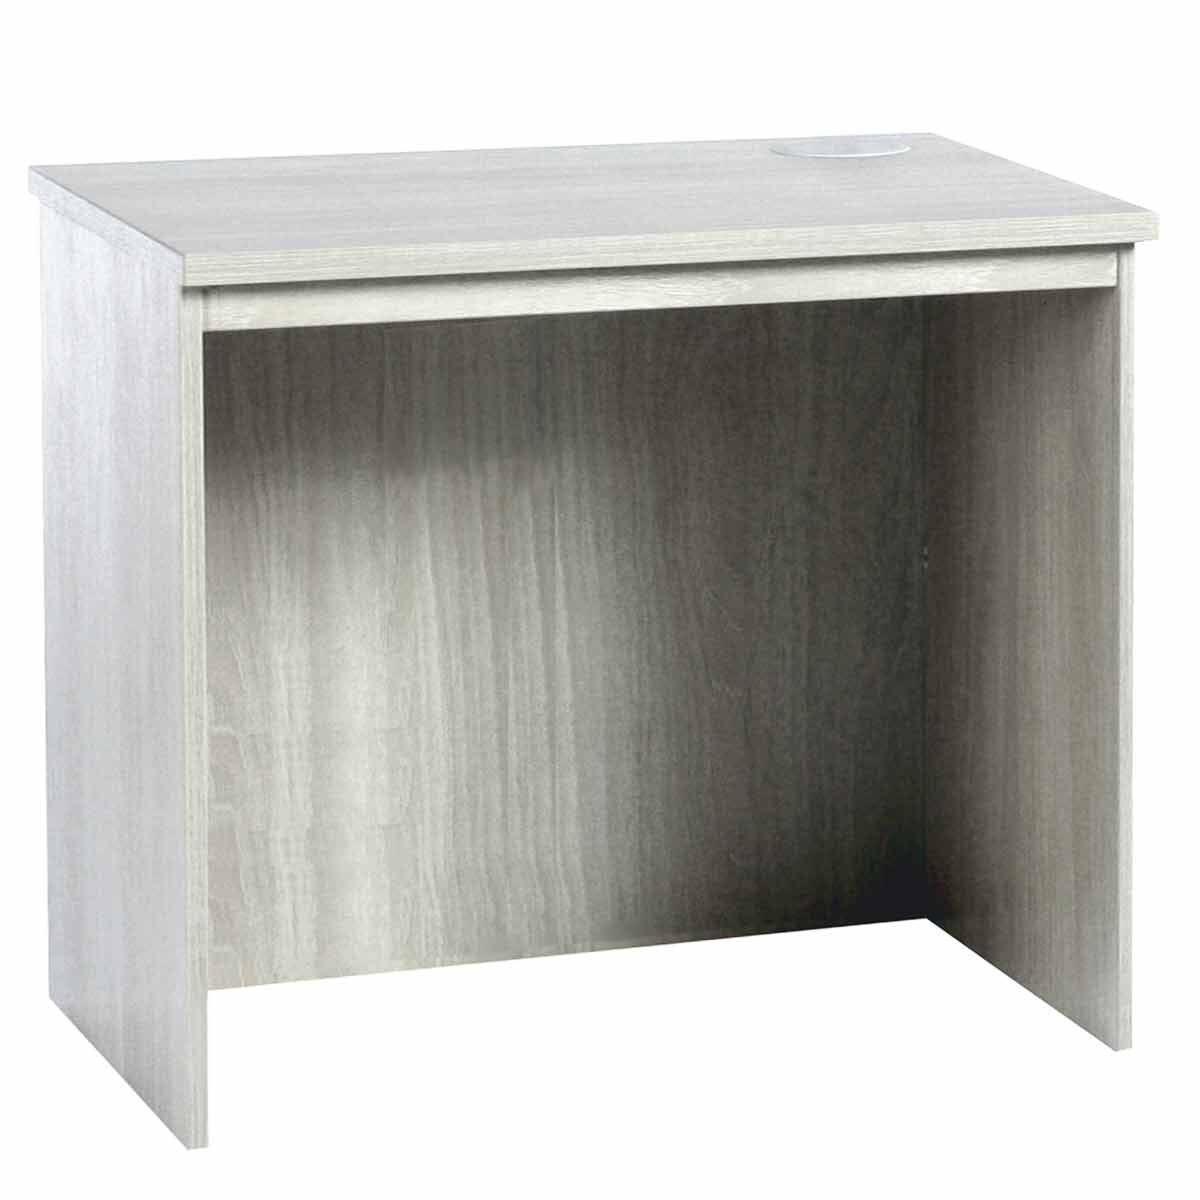 R White Medium Desk 850mm Wide Grey Nebraska